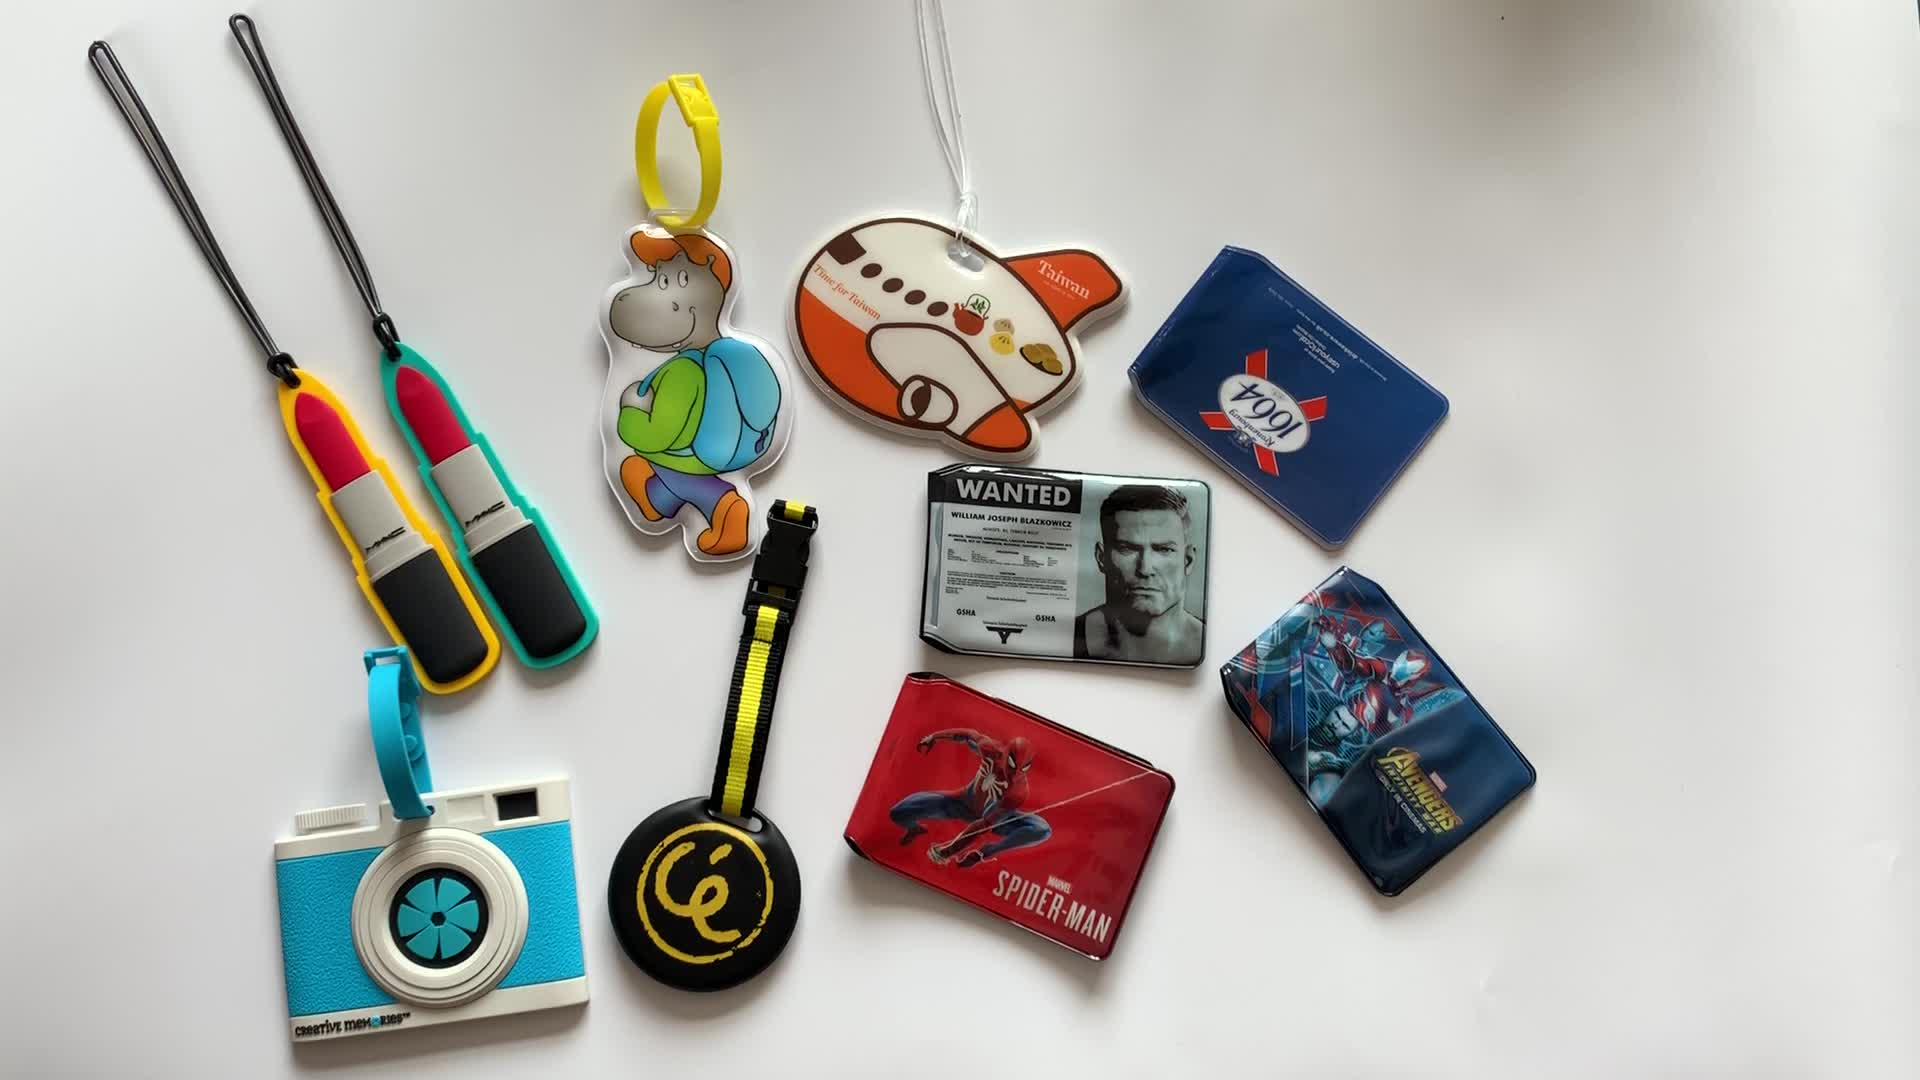 Pvc Id-kaart Houder Clear Soft Plastic Id Card Houders/Print Goedkope Pvc Id Kaarthouder